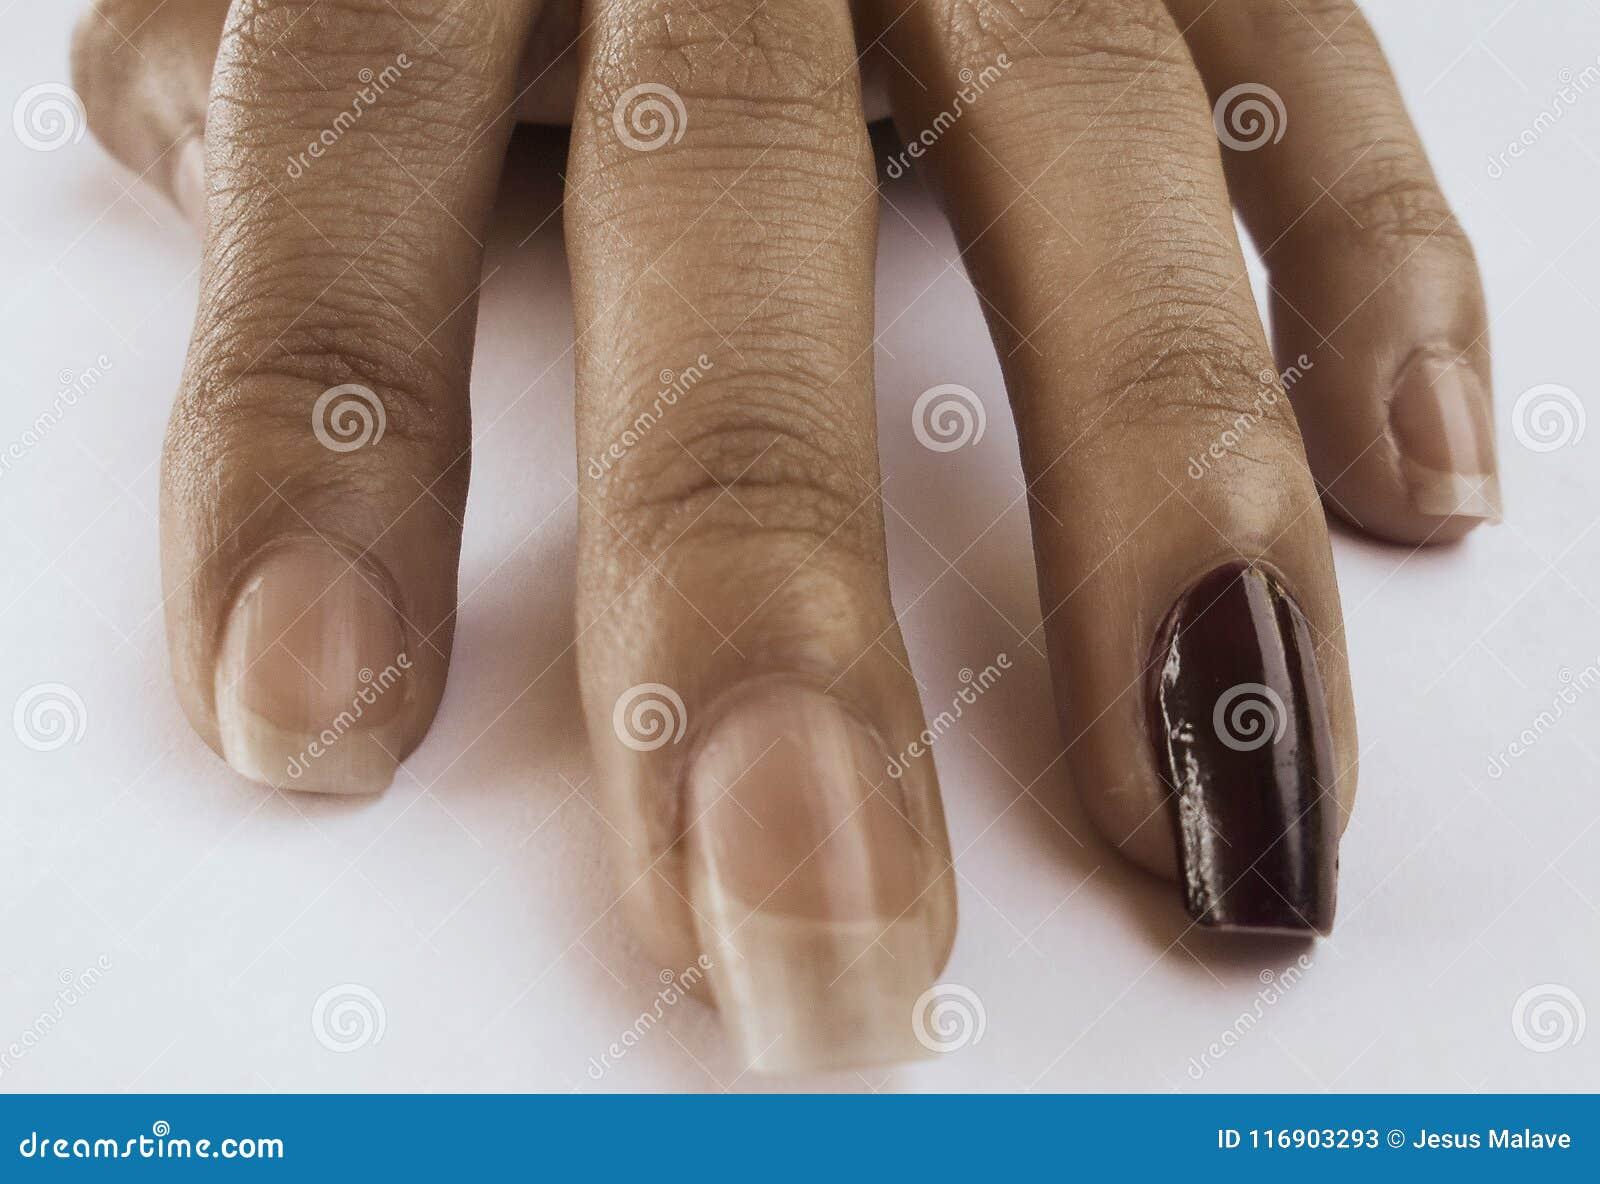 Fingeres de una mano perfectamente natural